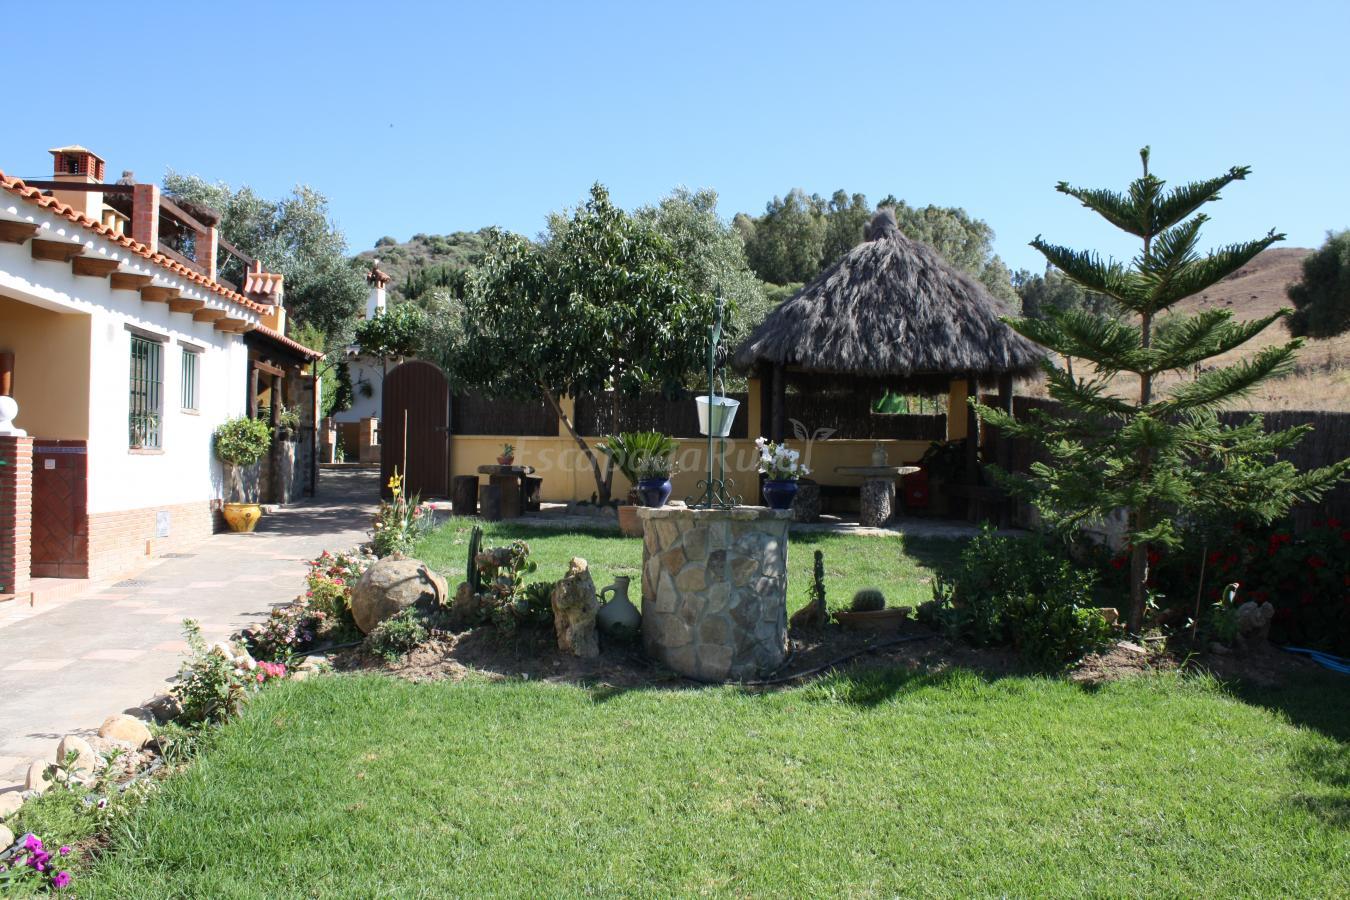 Fotos de el corral casa rural en jimena de la frontera - Casa rural jimena ...